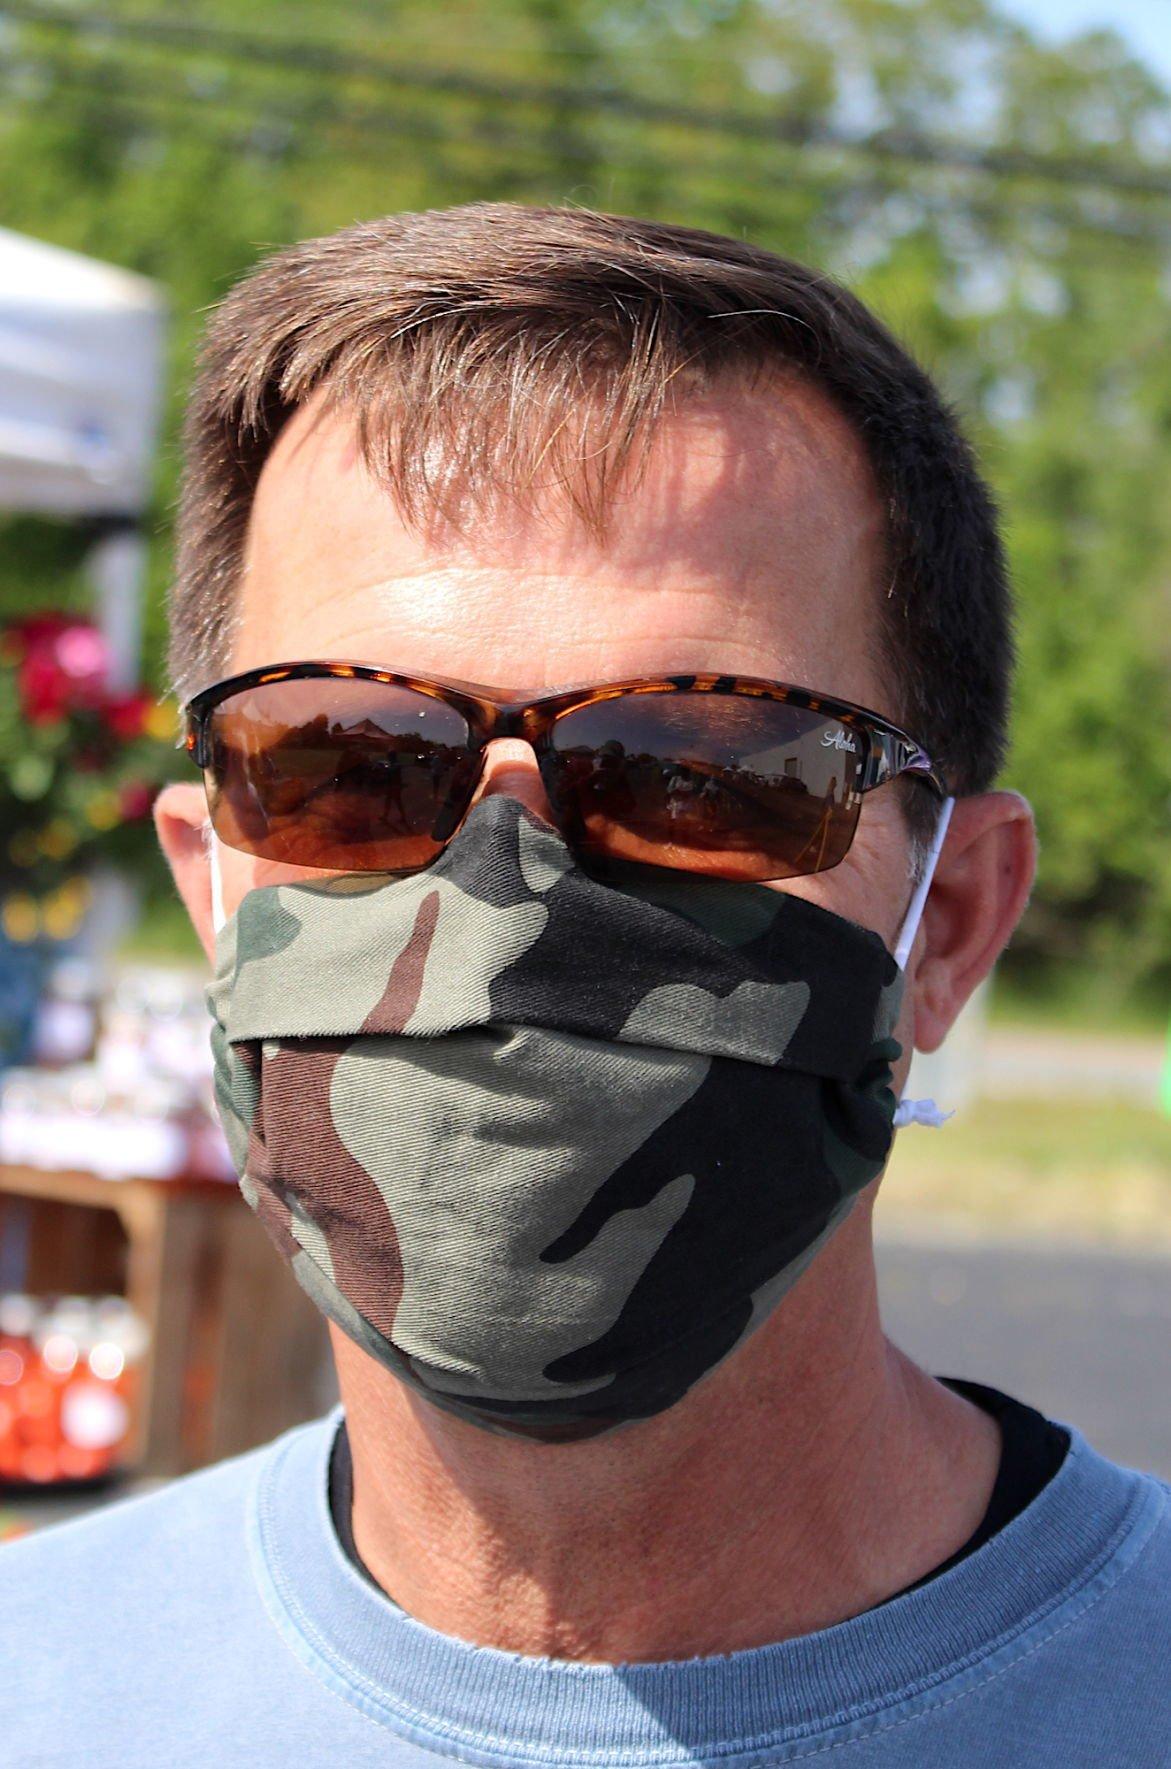 Bay views 05-27-20 (good quarantine)